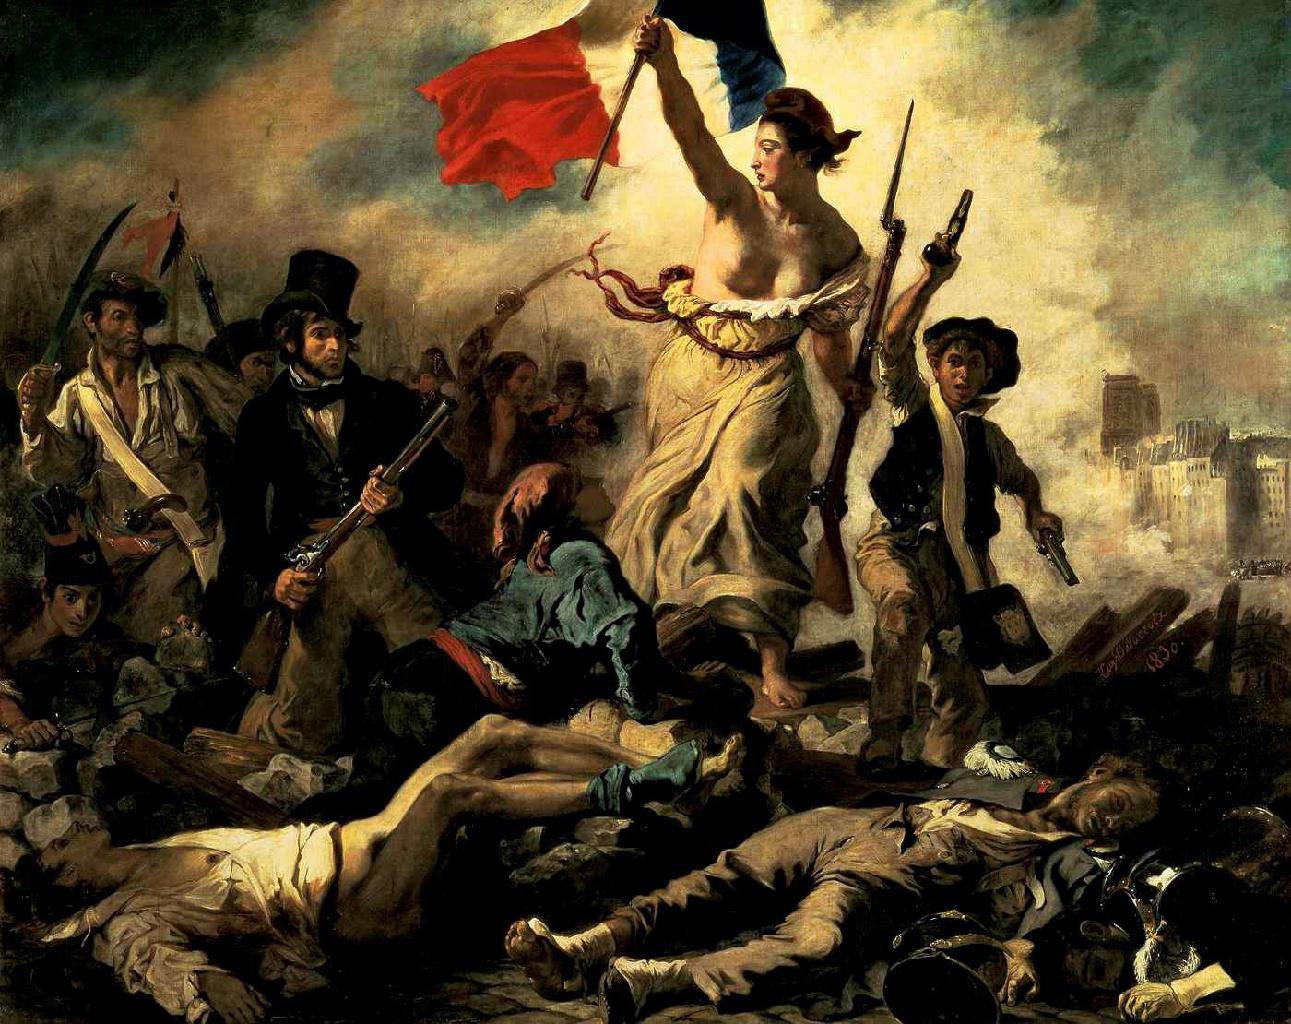 Eugene Delacroix - La Liberte - Marianne